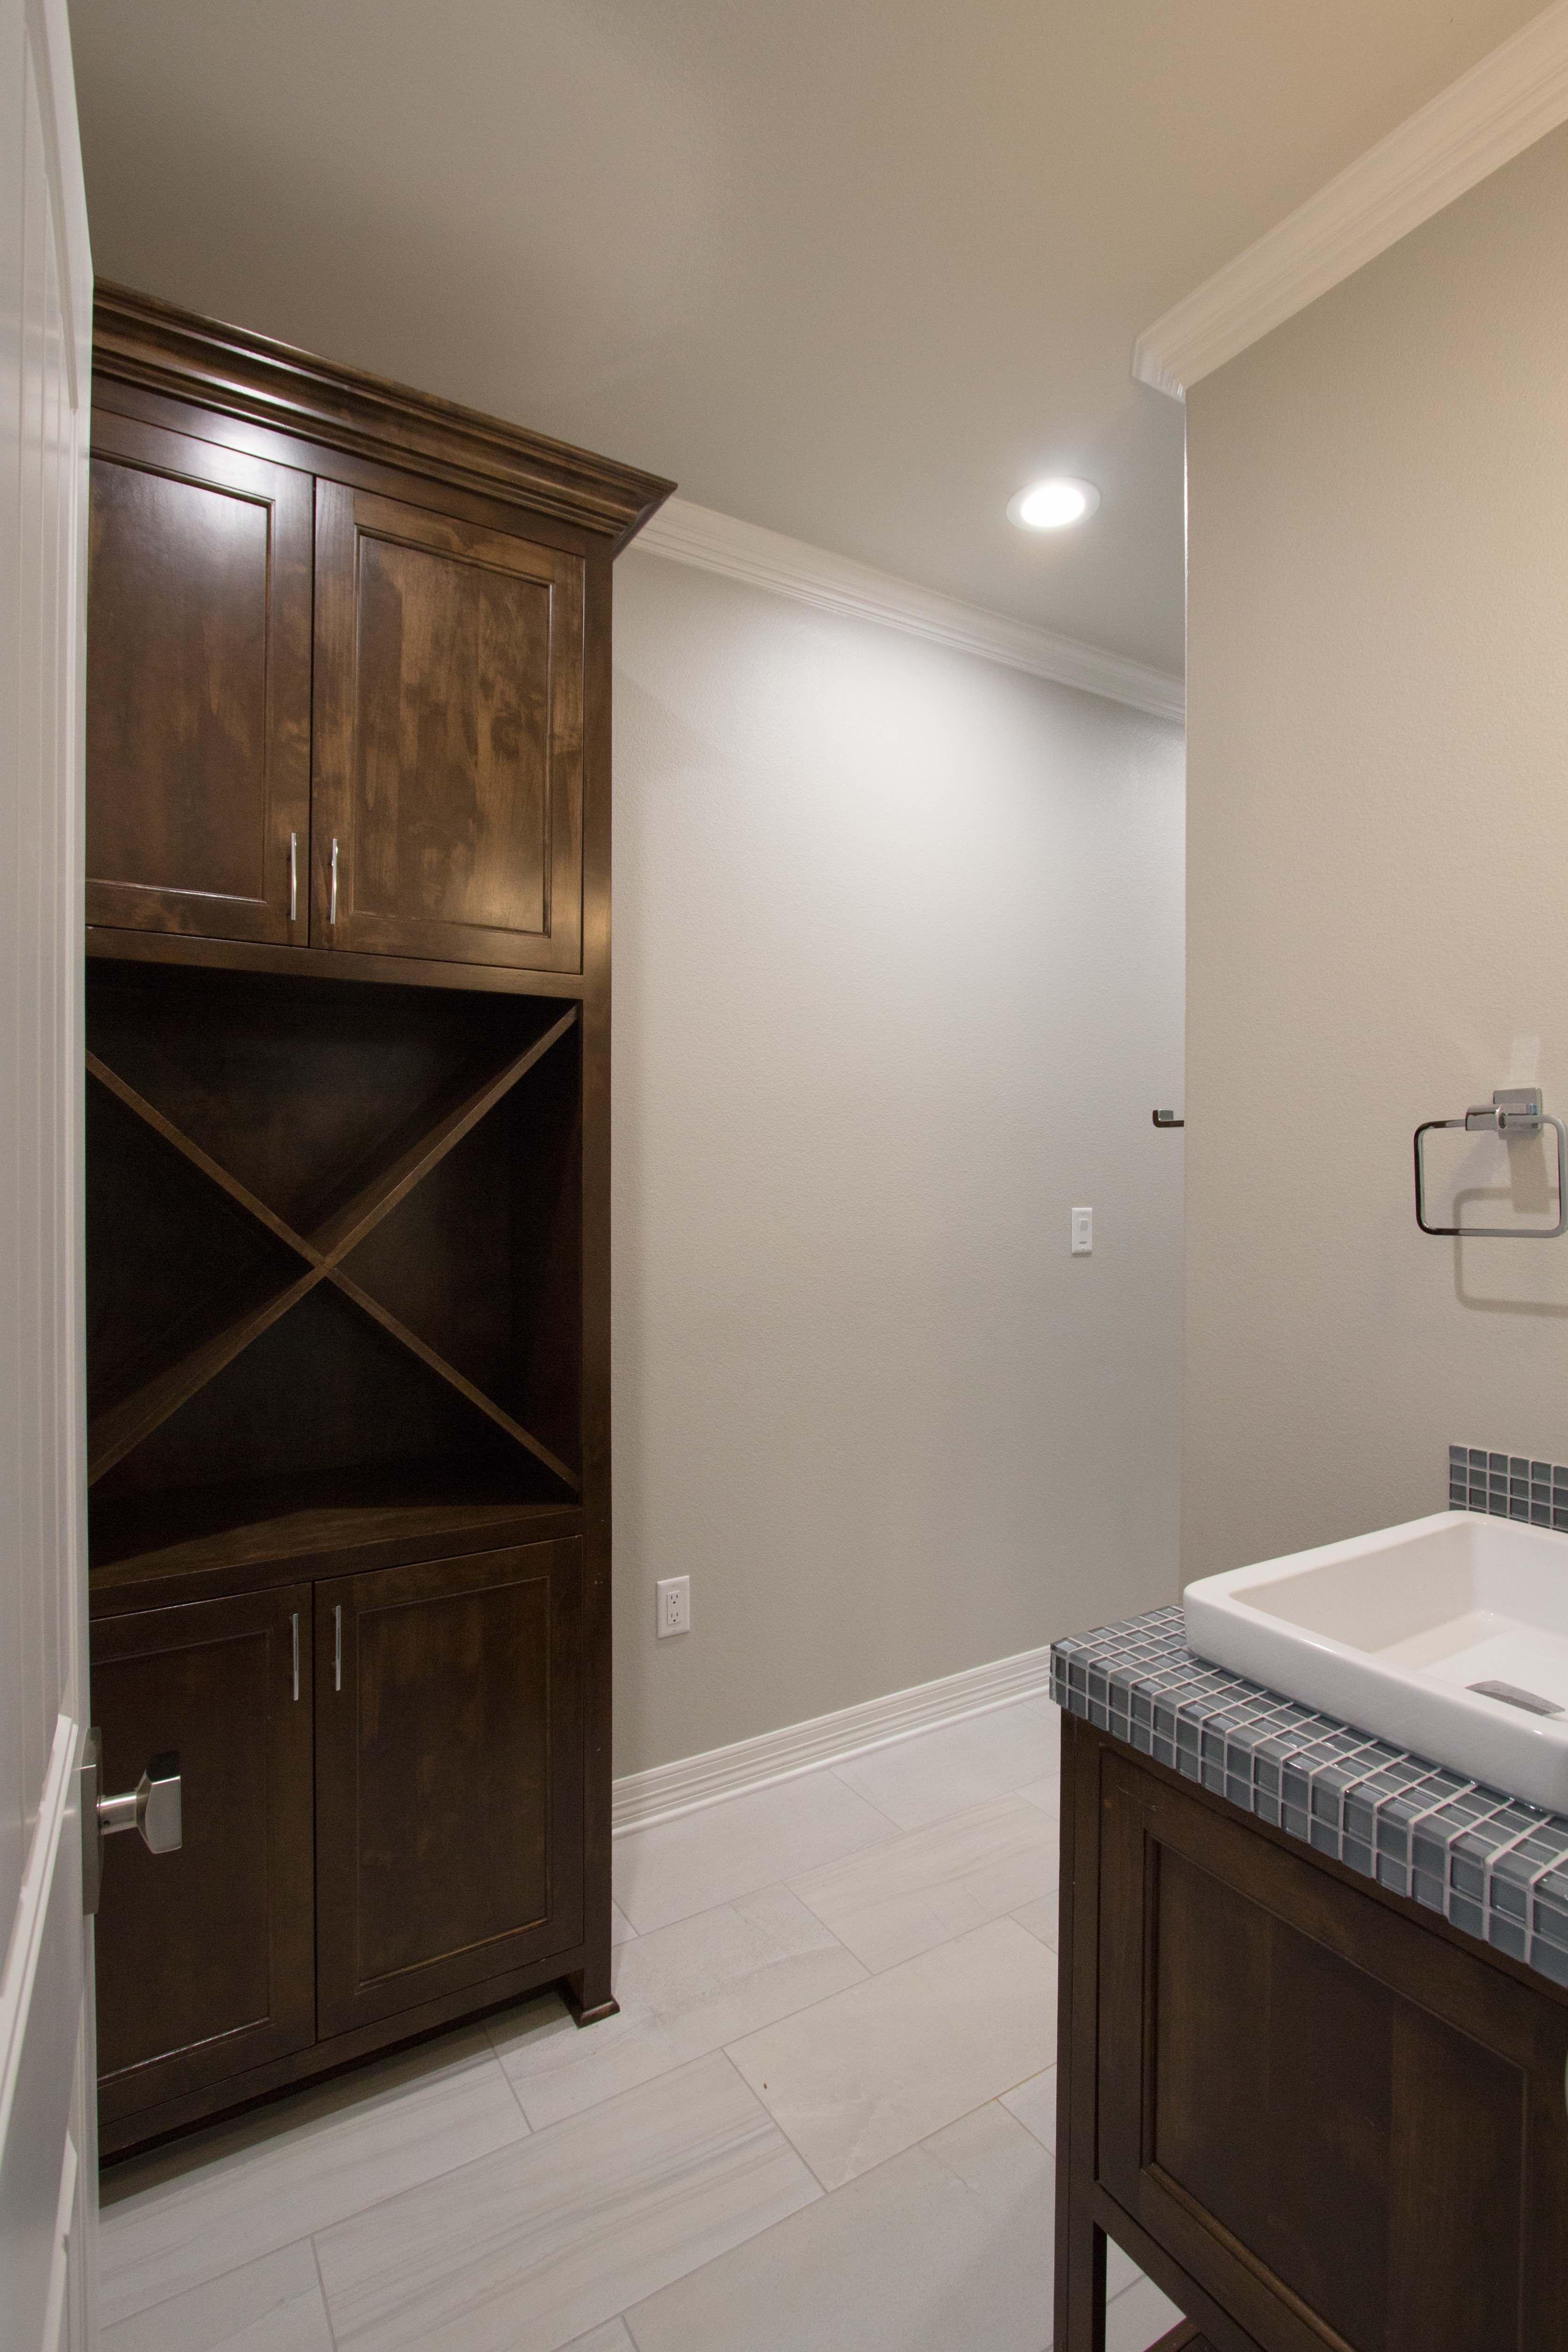 Pool Bath With Happy Floors Rhin Blanco Tile By Studi